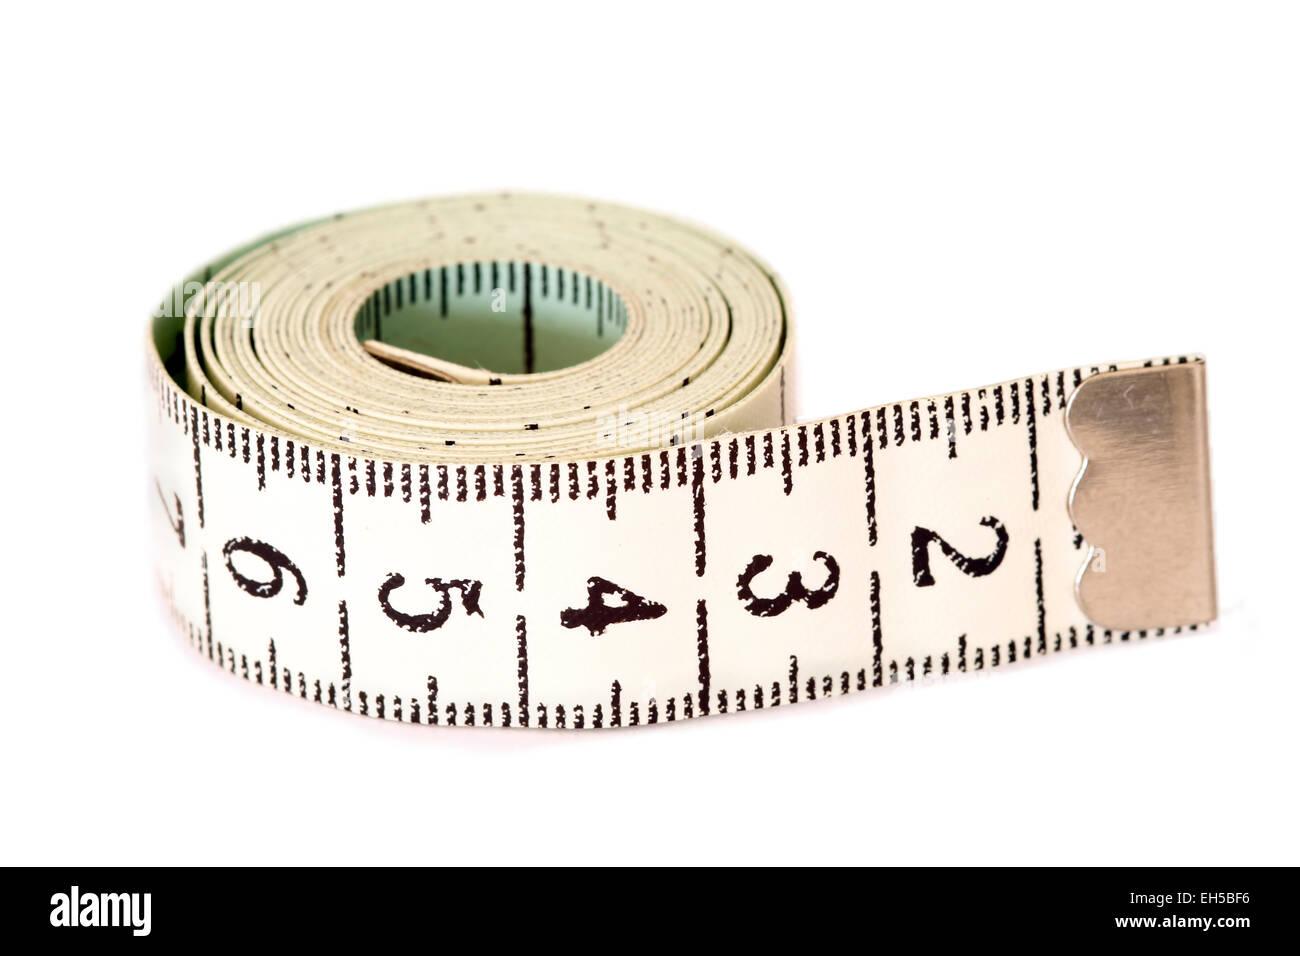 tape measure - Stock Image